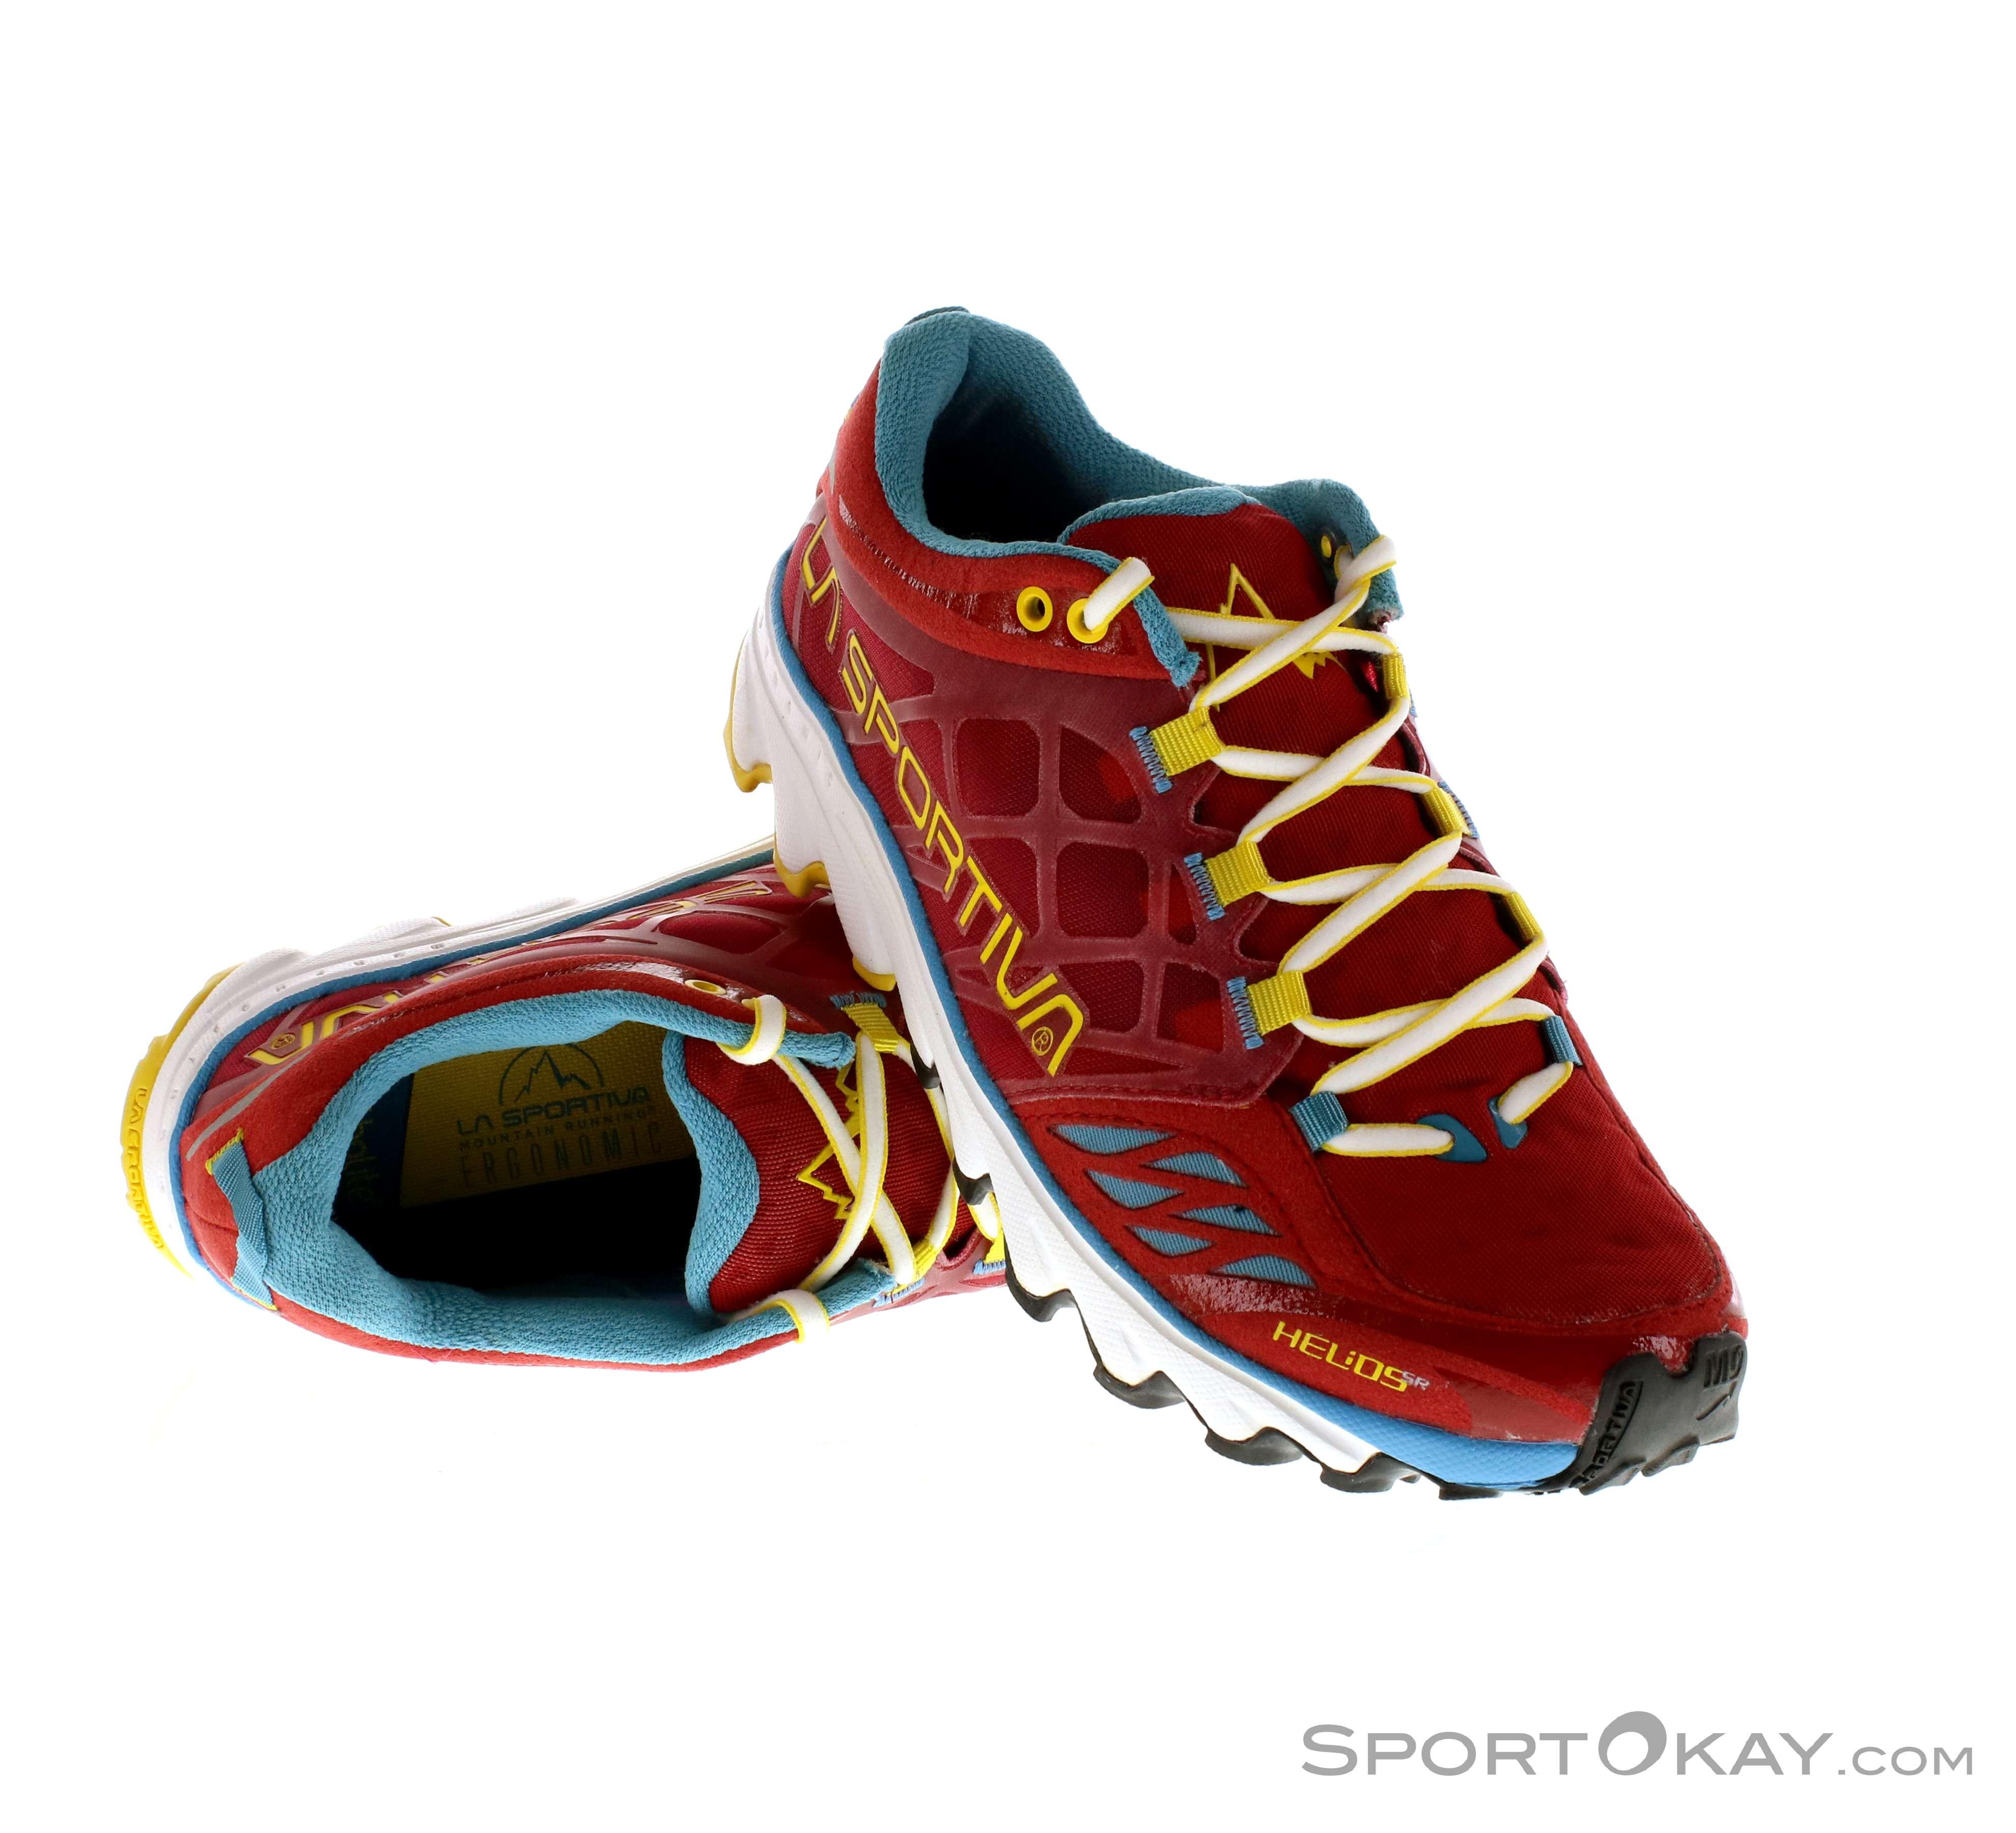 1a8d64ac4086 La Sportiva Helios SR Womens Trail Running Shoes - Trail Running ...